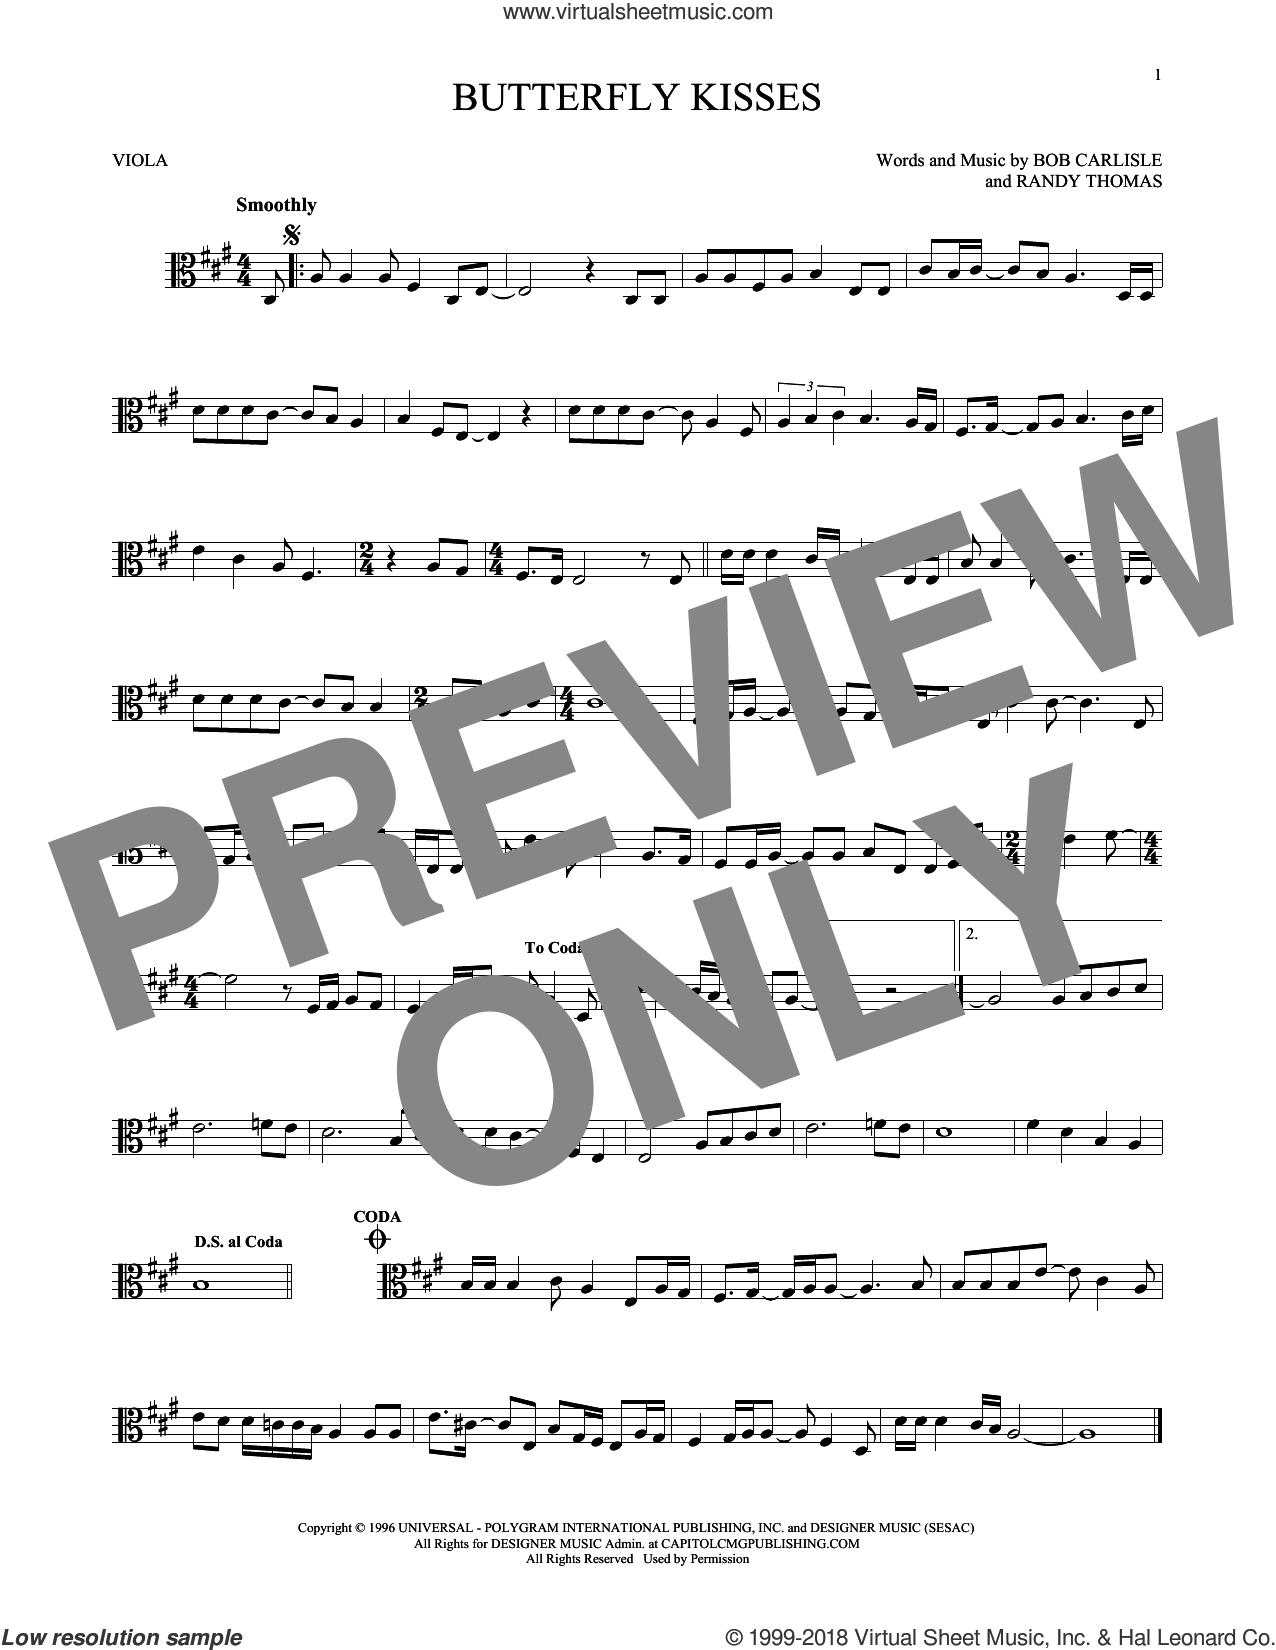 Butterfly Kisses sheet music for viola solo by Bob Carlisle, Jeff Carson and Randy Thomas, wedding score, intermediate skill level